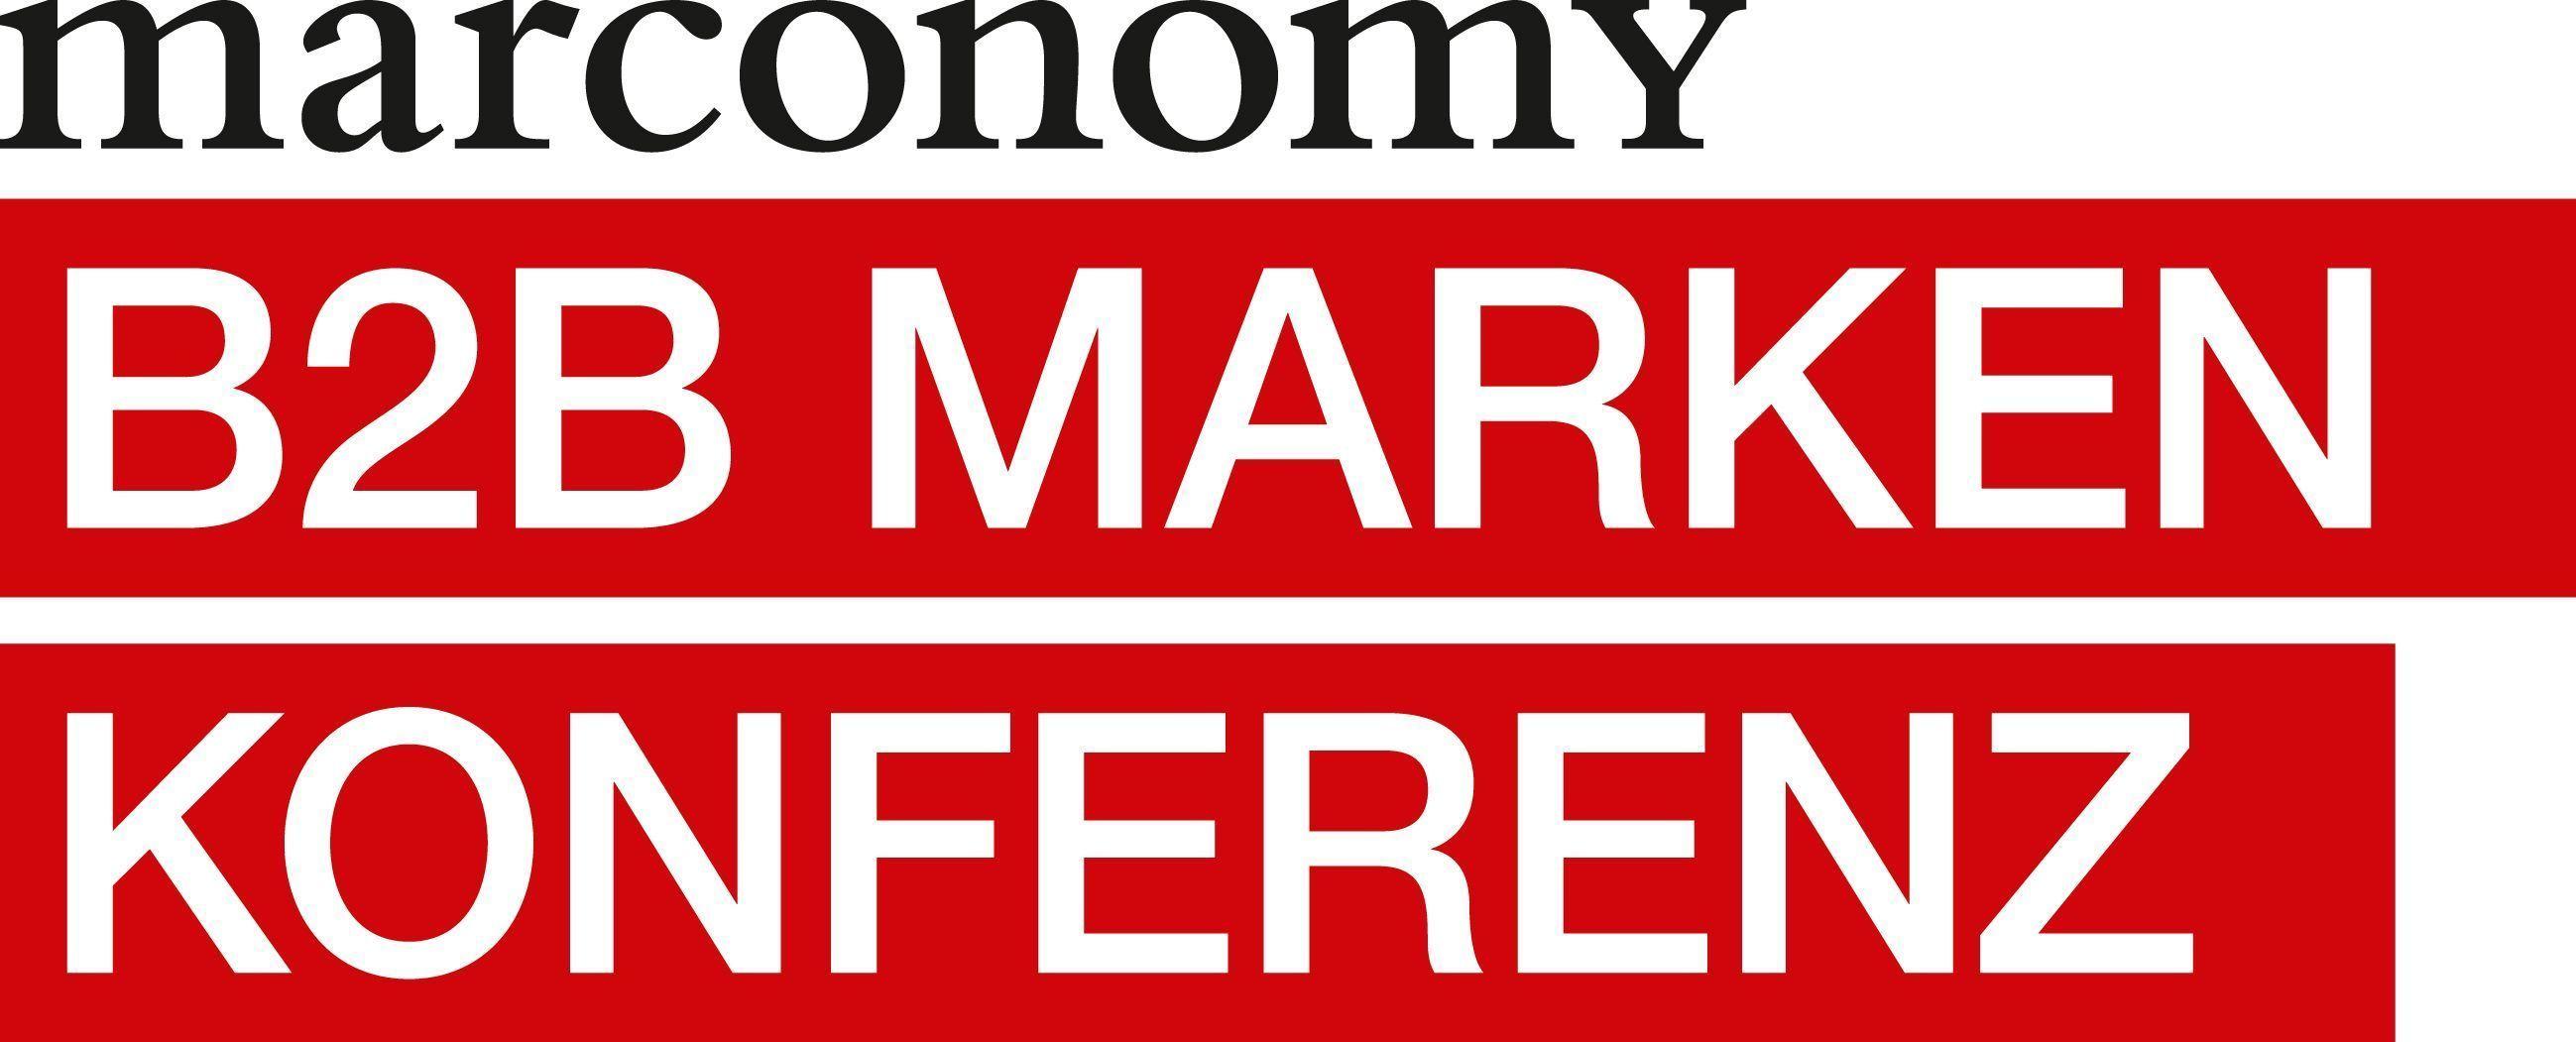 marconomy Markenkonferenz B2B